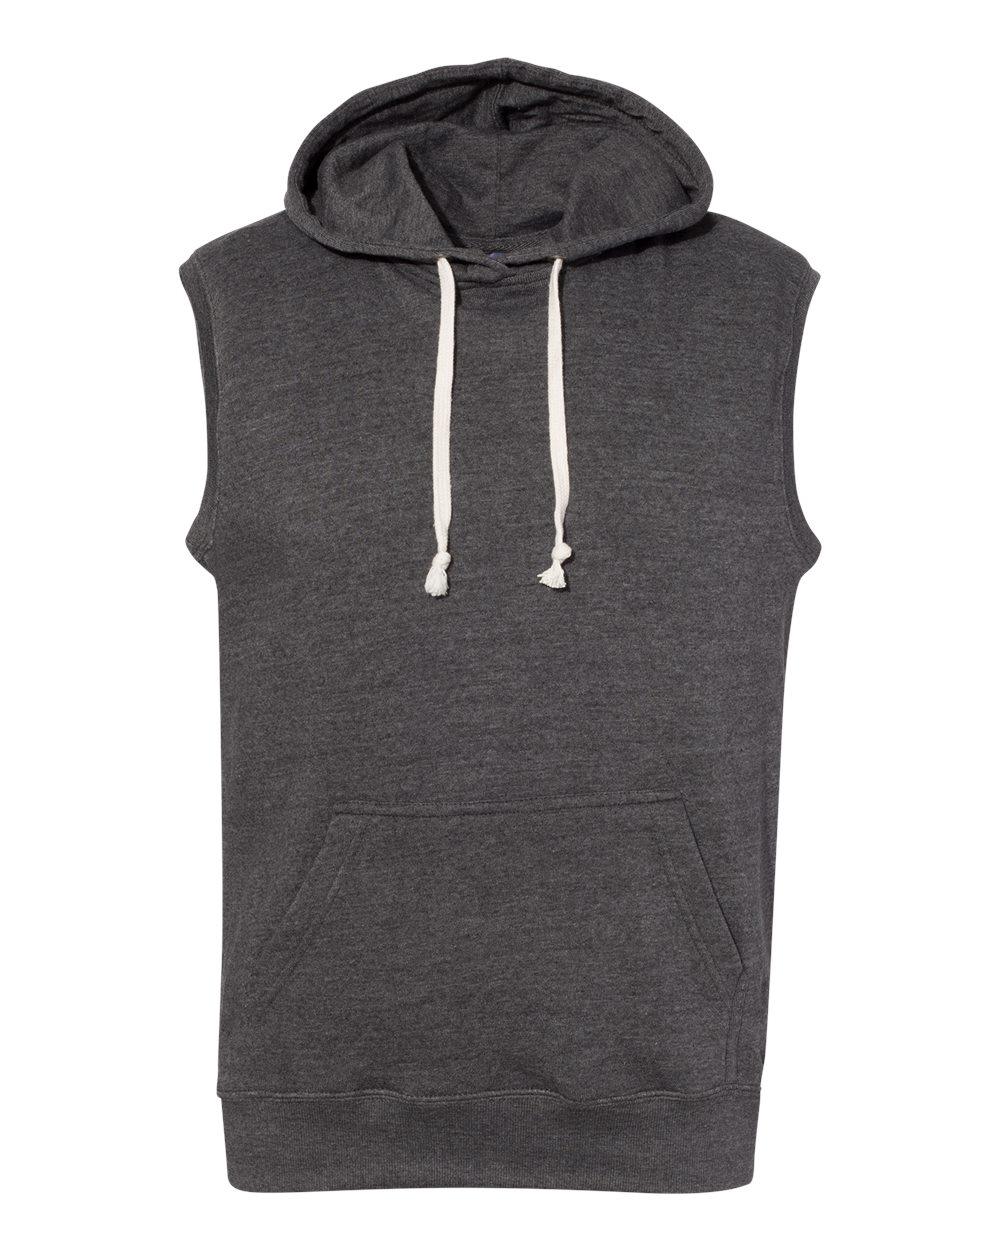 J. America - 8877 - Triblend Sleeveless Hooded Sweatshirt